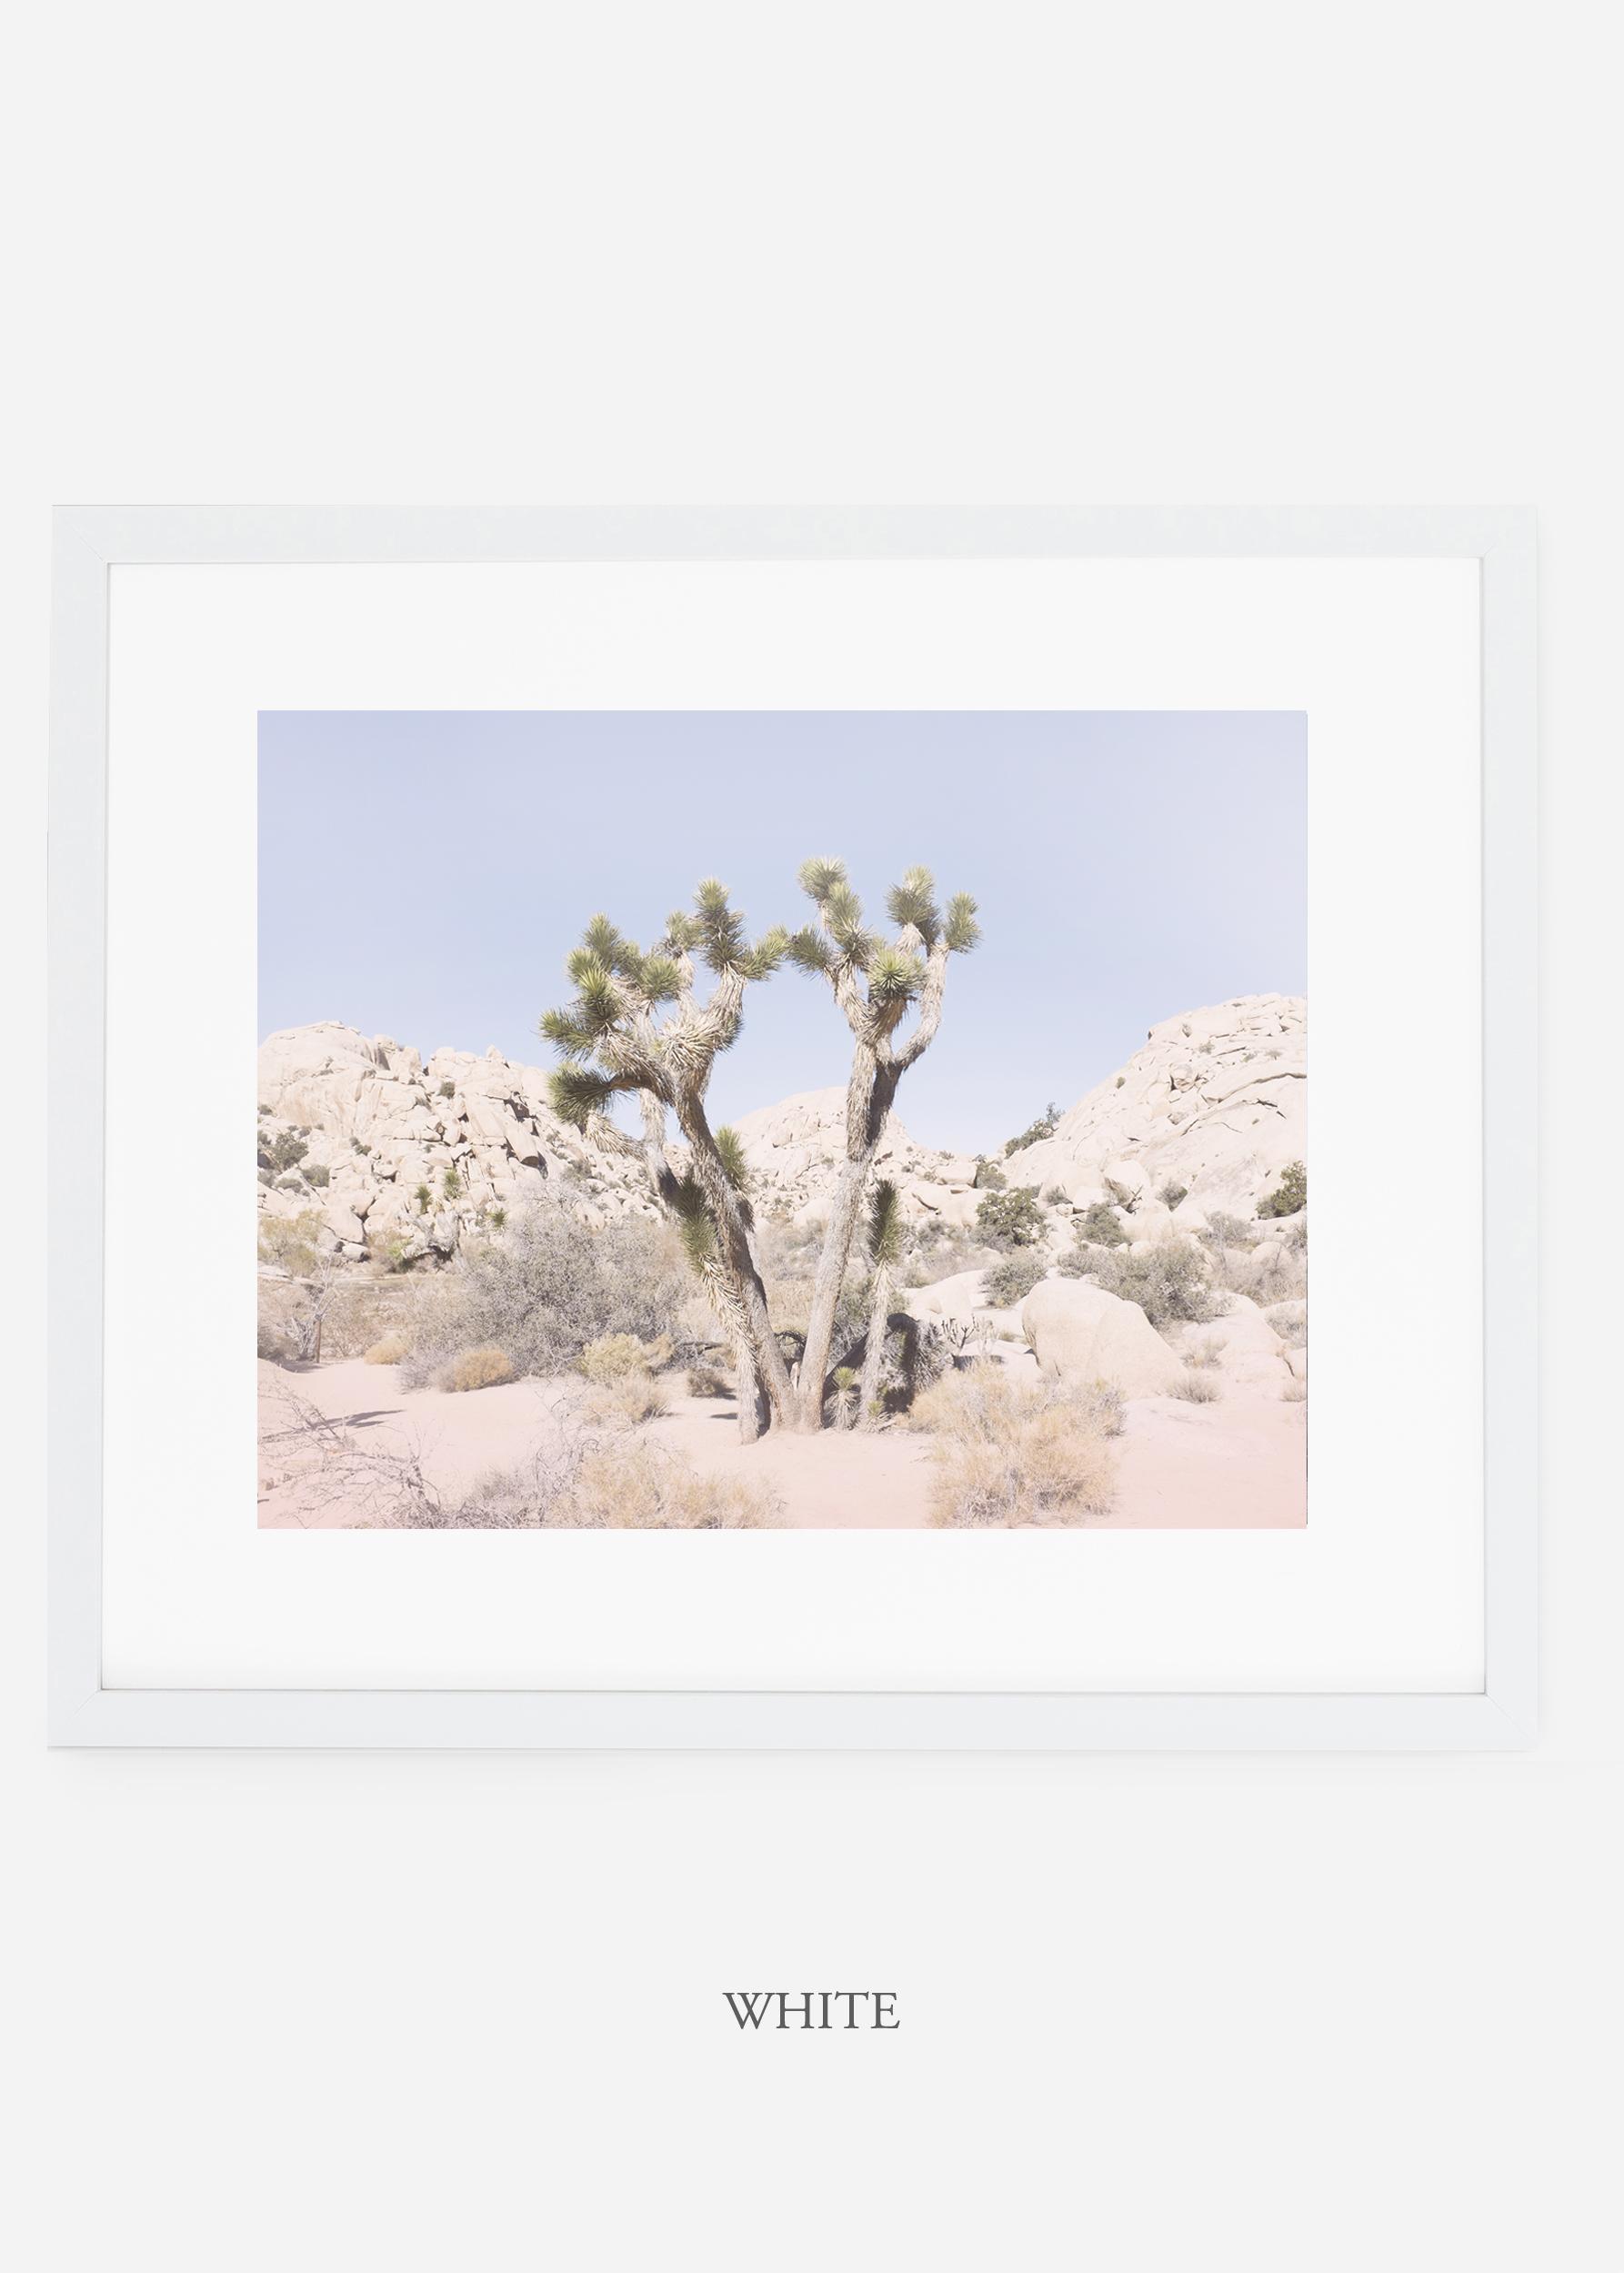 WilderCalifornia_whiteframe_JoshuaTree_No.16_interiordesign_prints_art.jpg